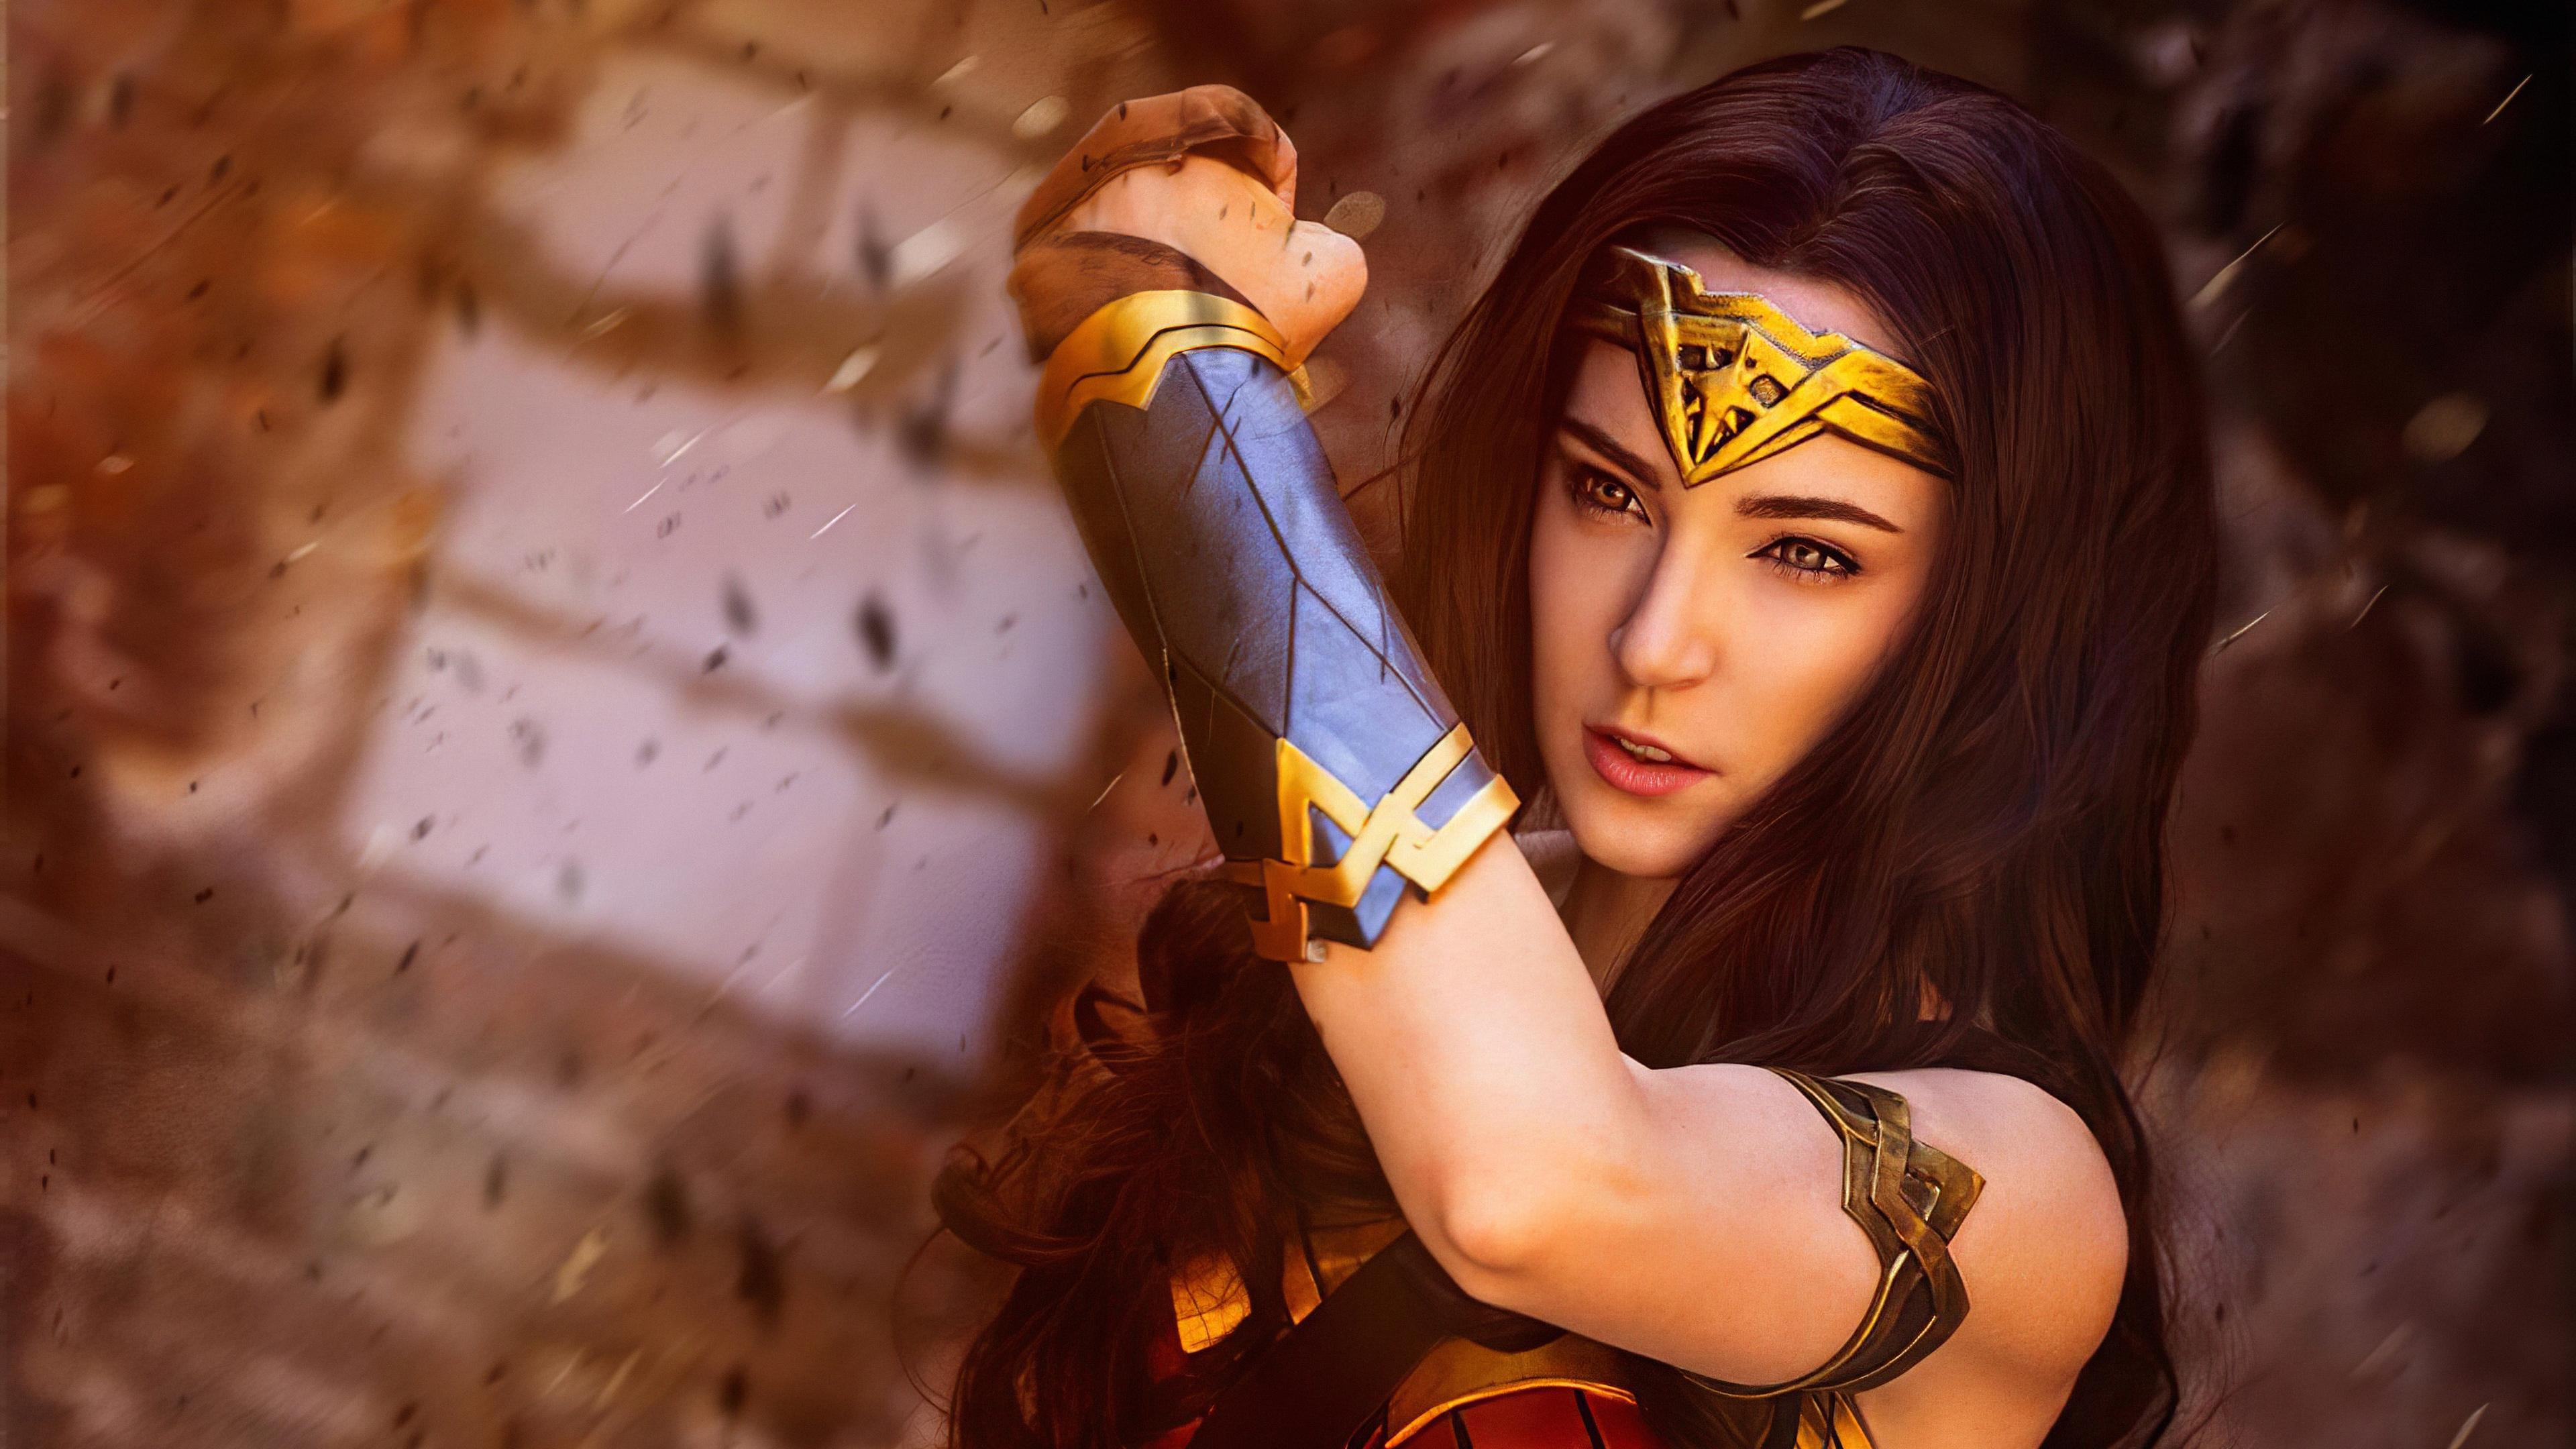 2019 wonder woman cosplay 1572367294 - 2019 Wonder Woman Cosplay - wonder woman wallpapers, superheroes wallpapers, hd-wallpapers, cosplay wallpapers, 4k-wallpapers